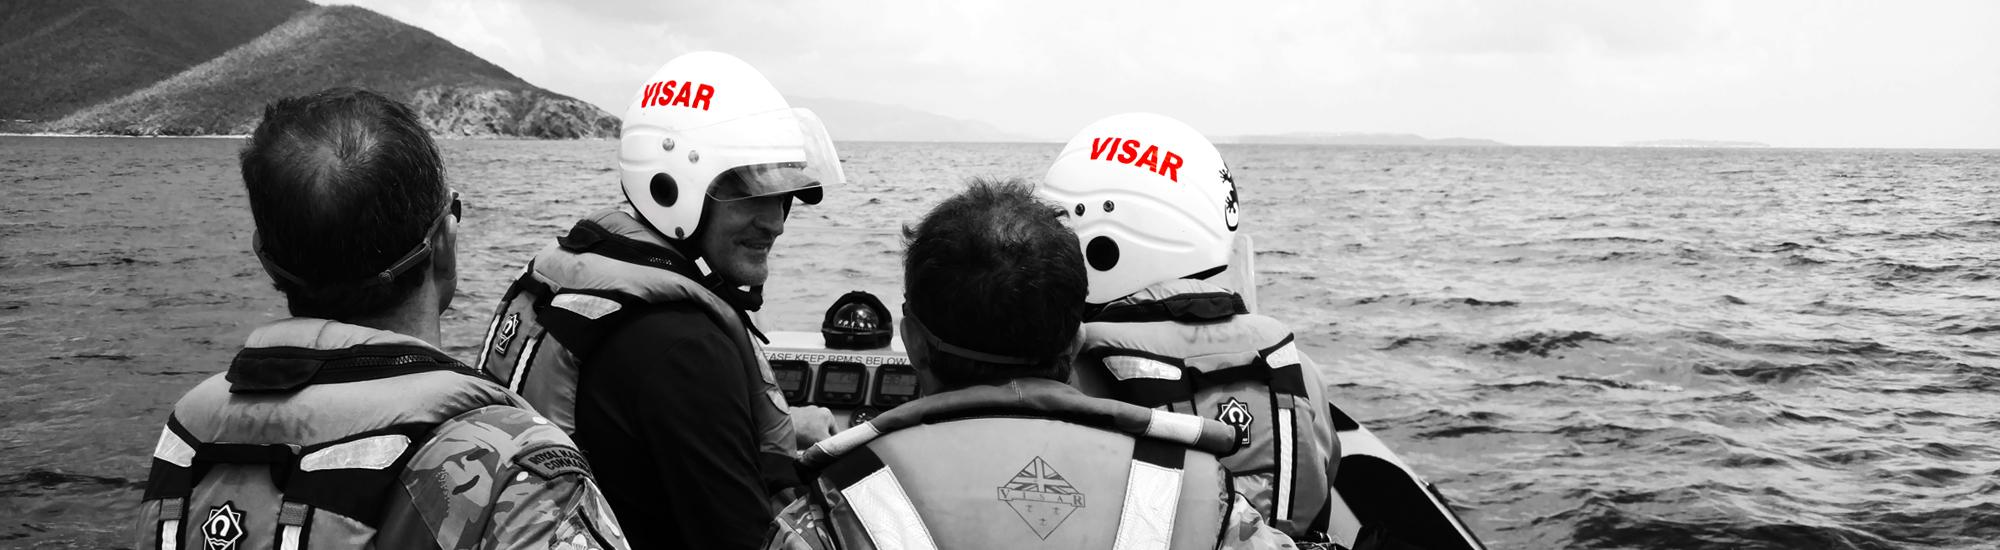 VISAR-blog-banner-02